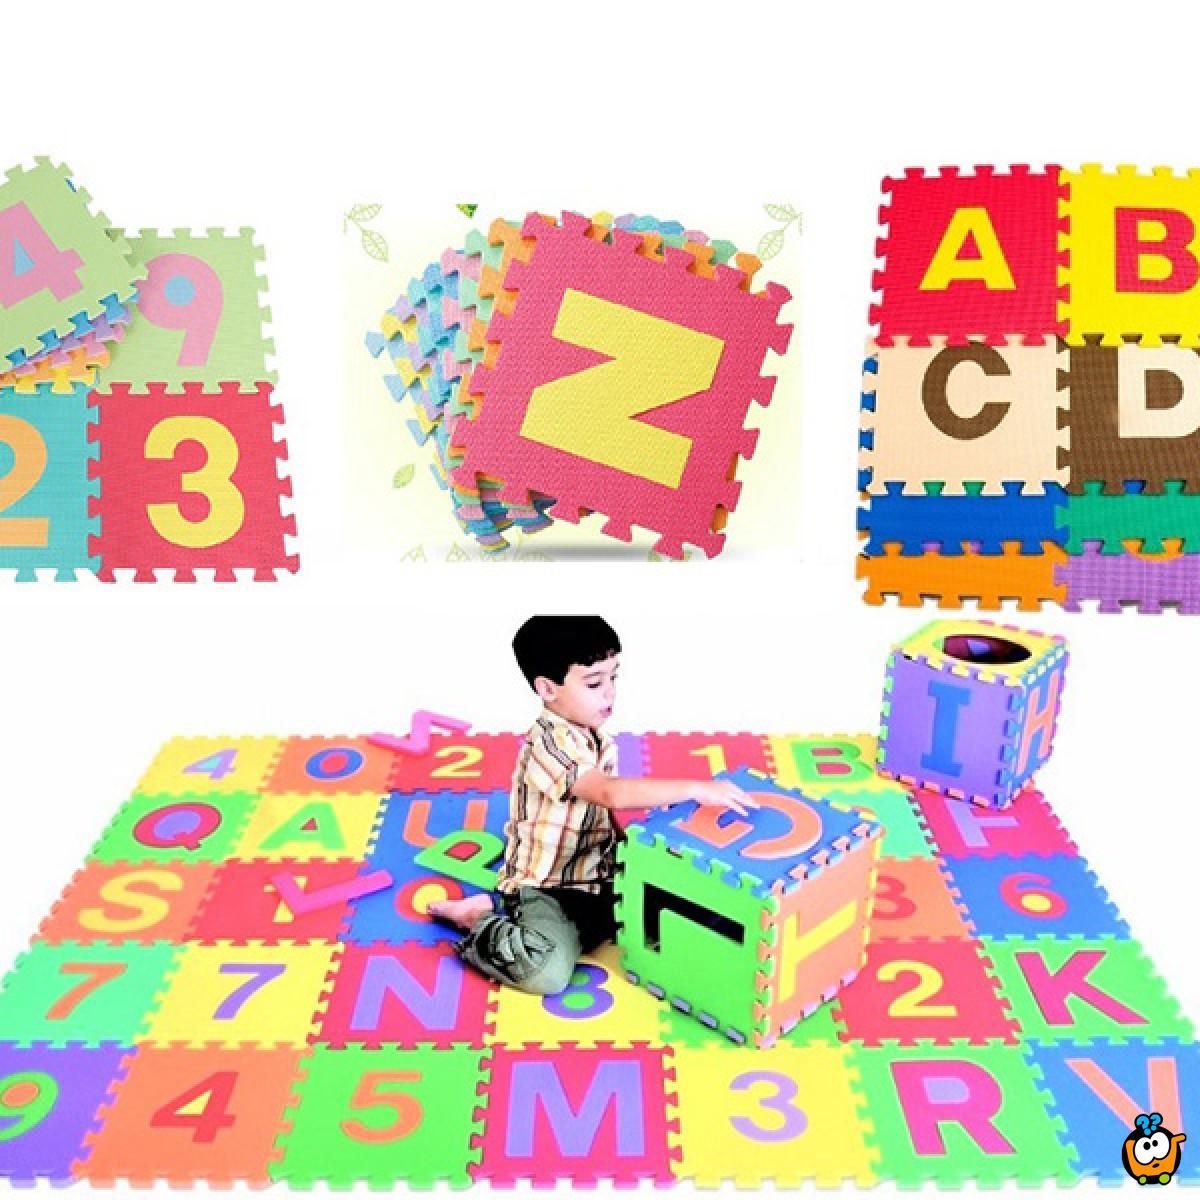 Dečije podne slagalice za igru - Brojevi i slova 10 komada 30x30 cm